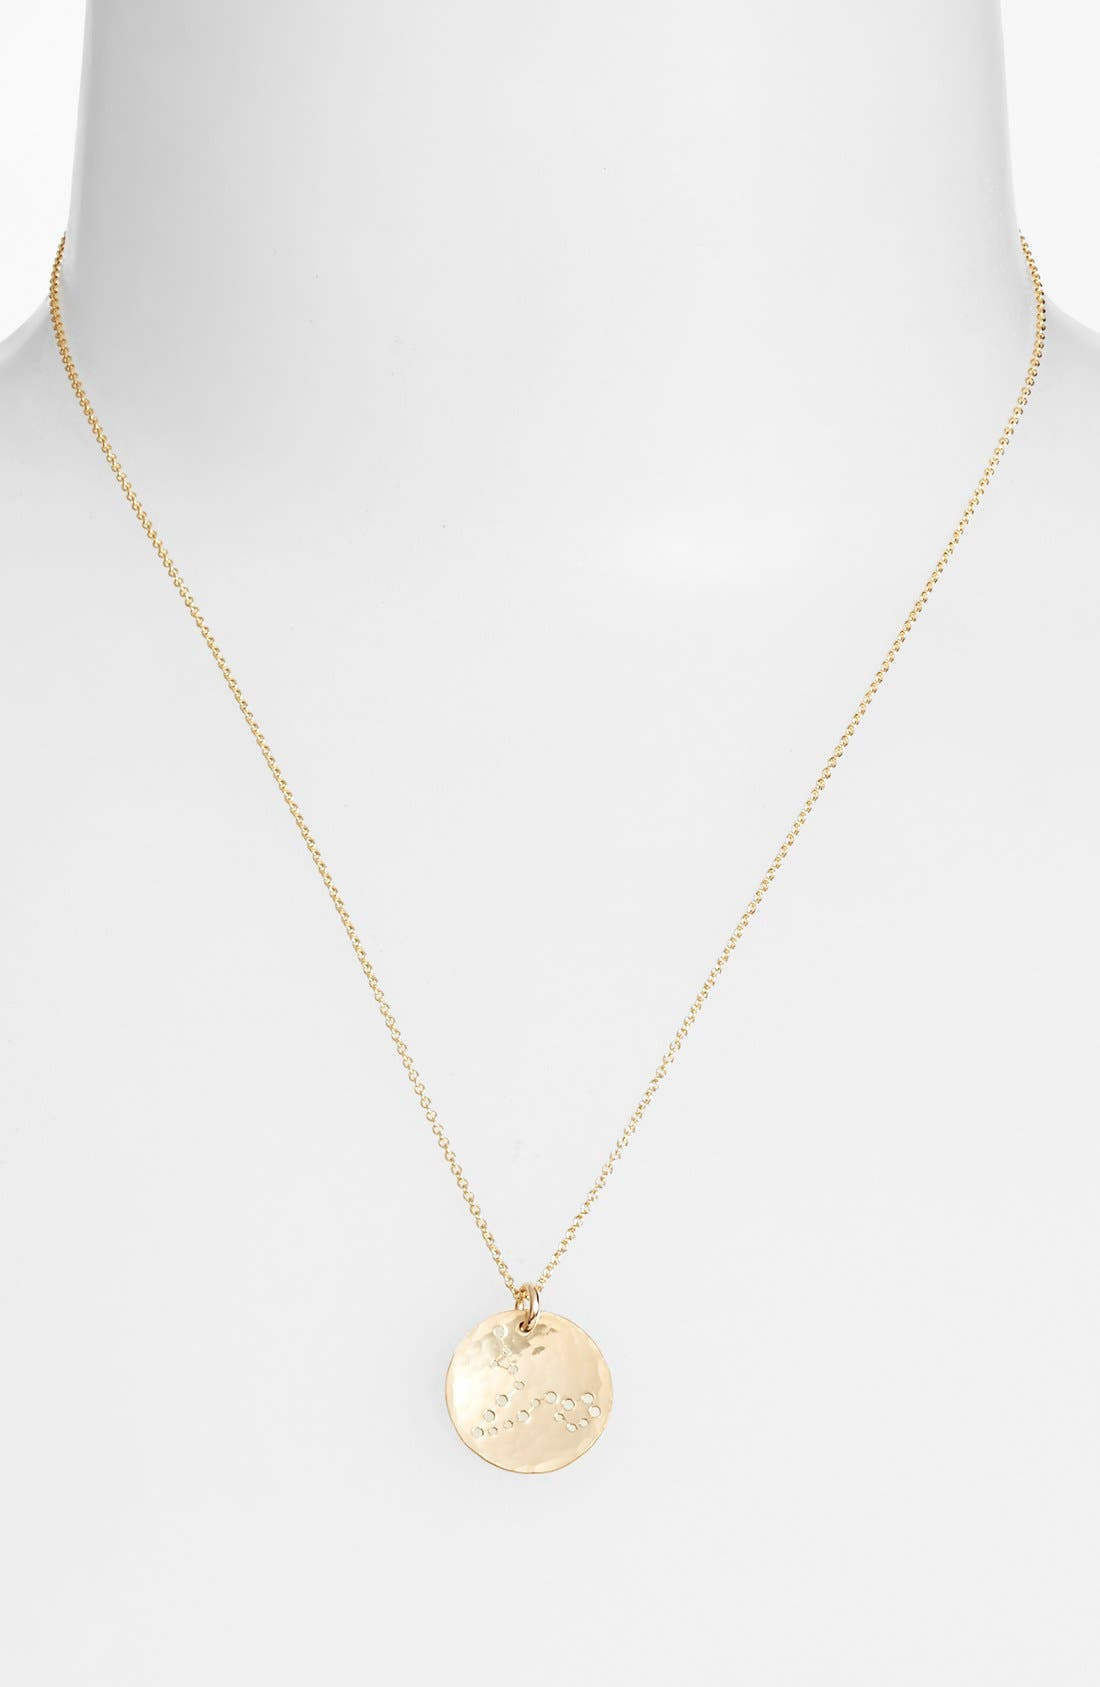 Ija 'Small Zodiac' 14k-Gold Fill Necklace,                             Alternate thumbnail 36, color,